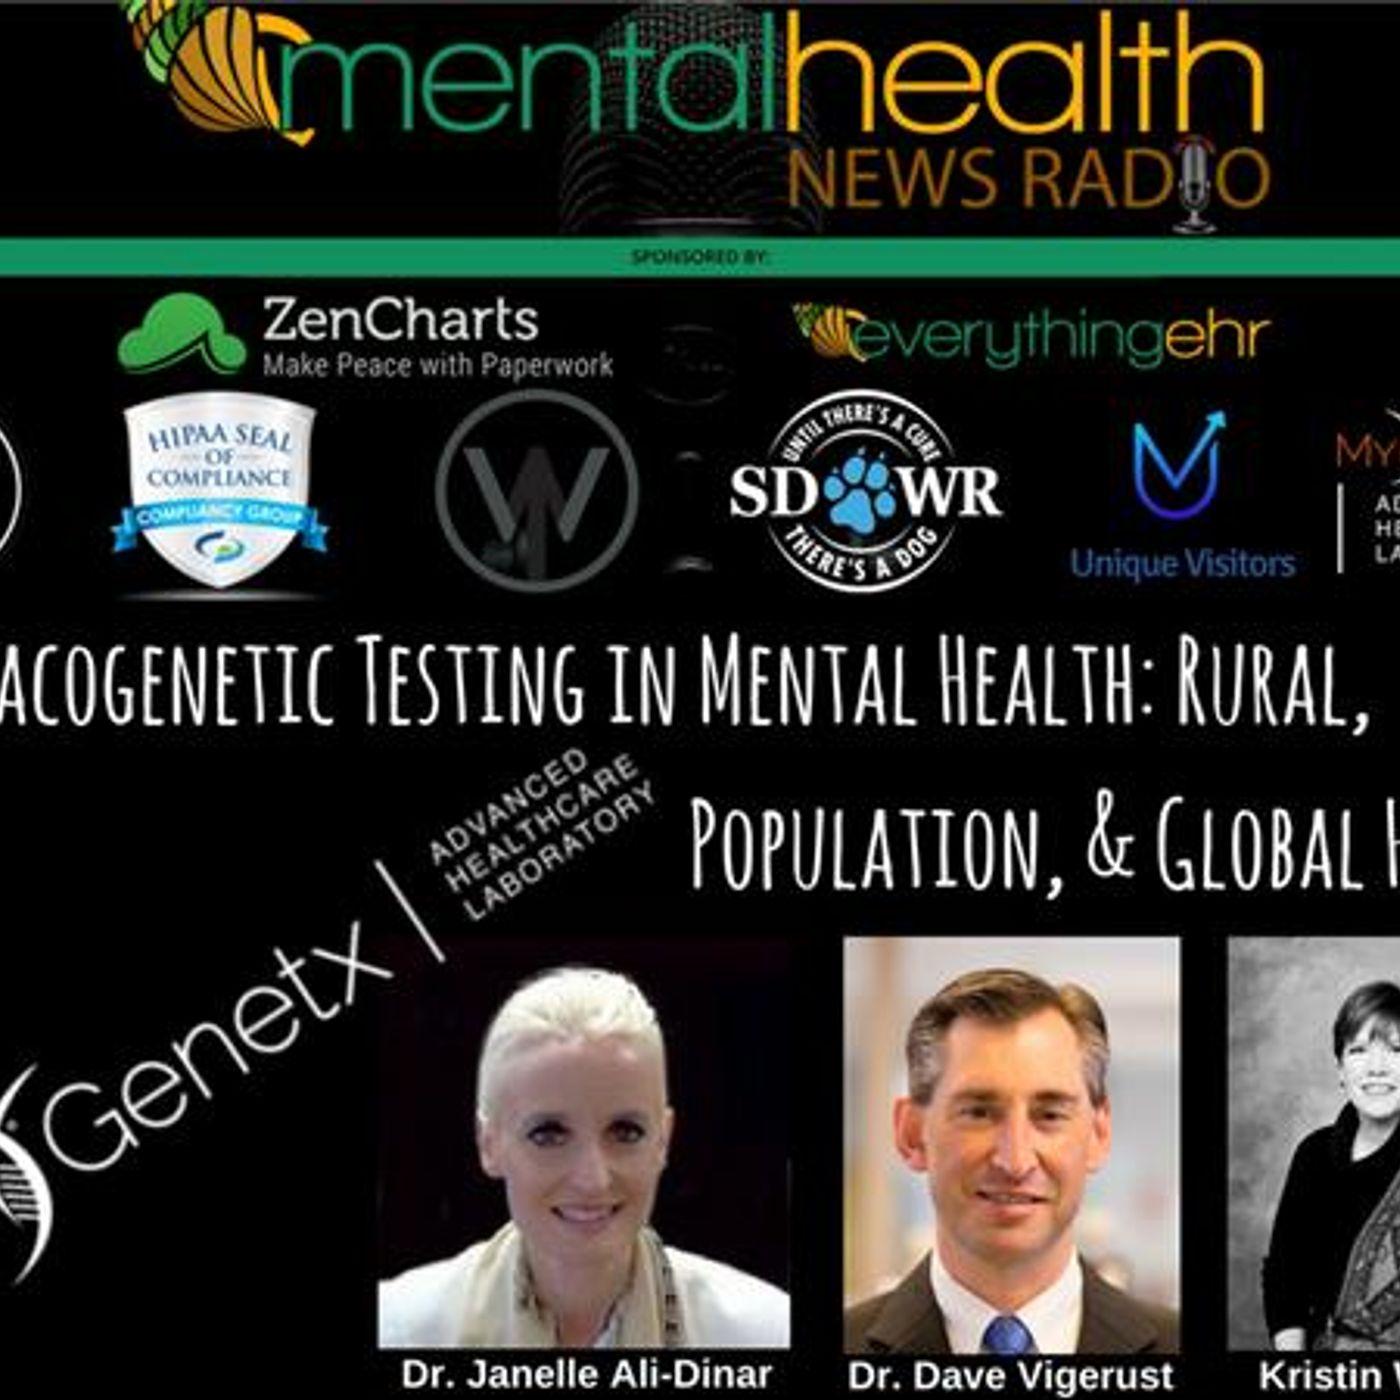 Mental Health News Radio - Pharmacogenetic Testing in Mental Health: Rural, Population, & Global Health